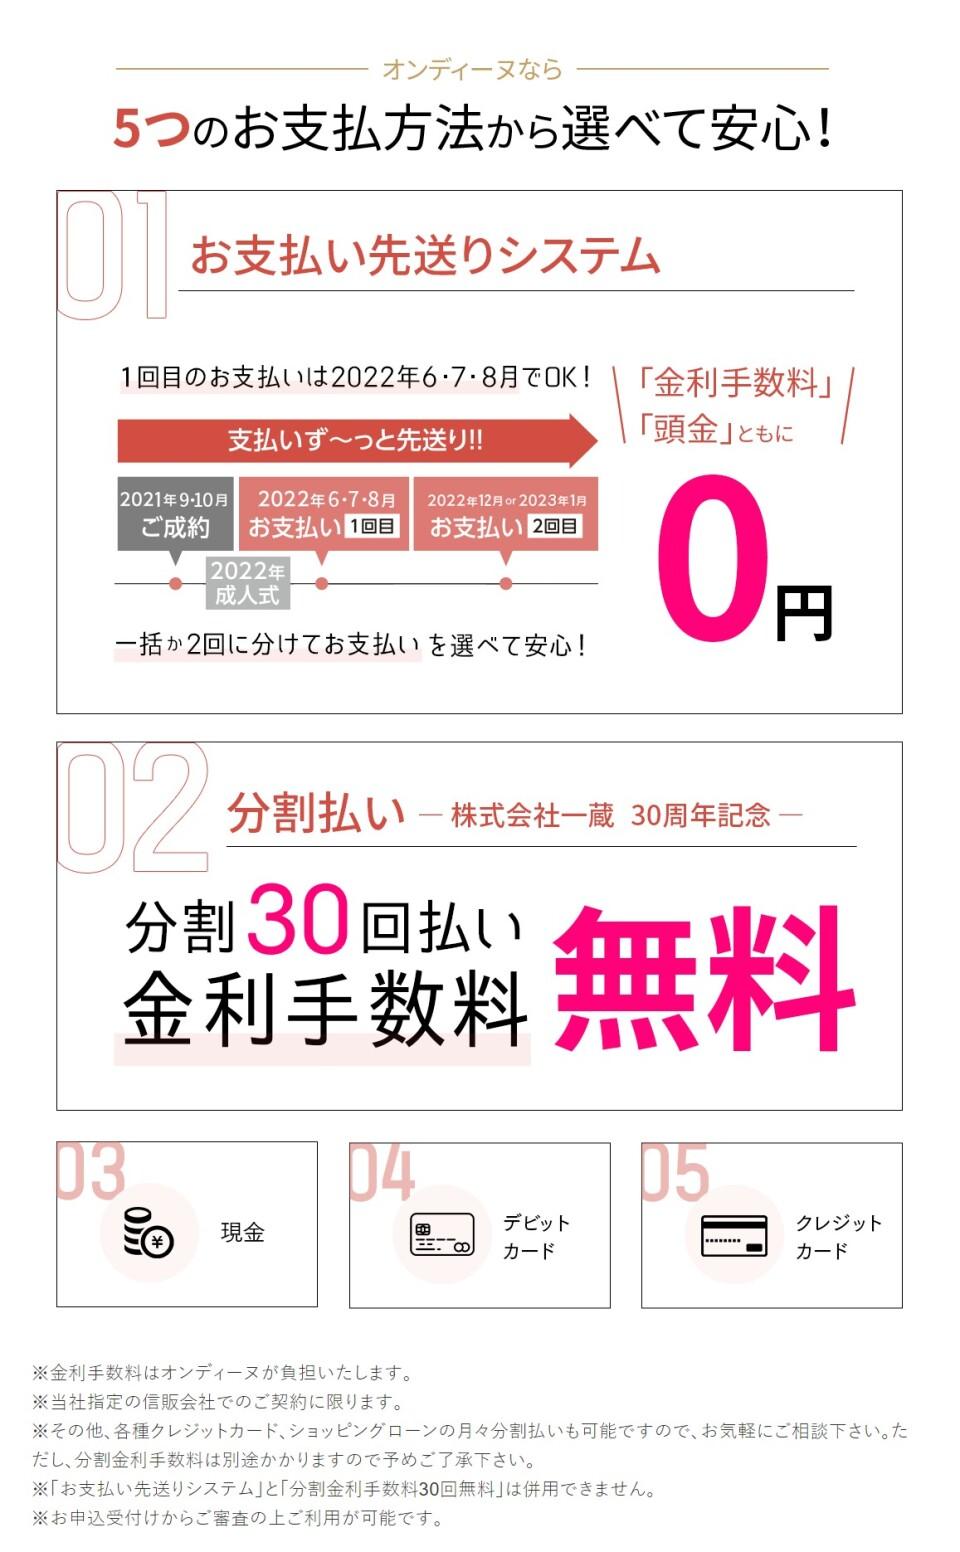 FireShot Capture 6417 - 振袖グランマルシェ|成人式の振袖レンタル・販売オンディーヌ - www.ondine.jp